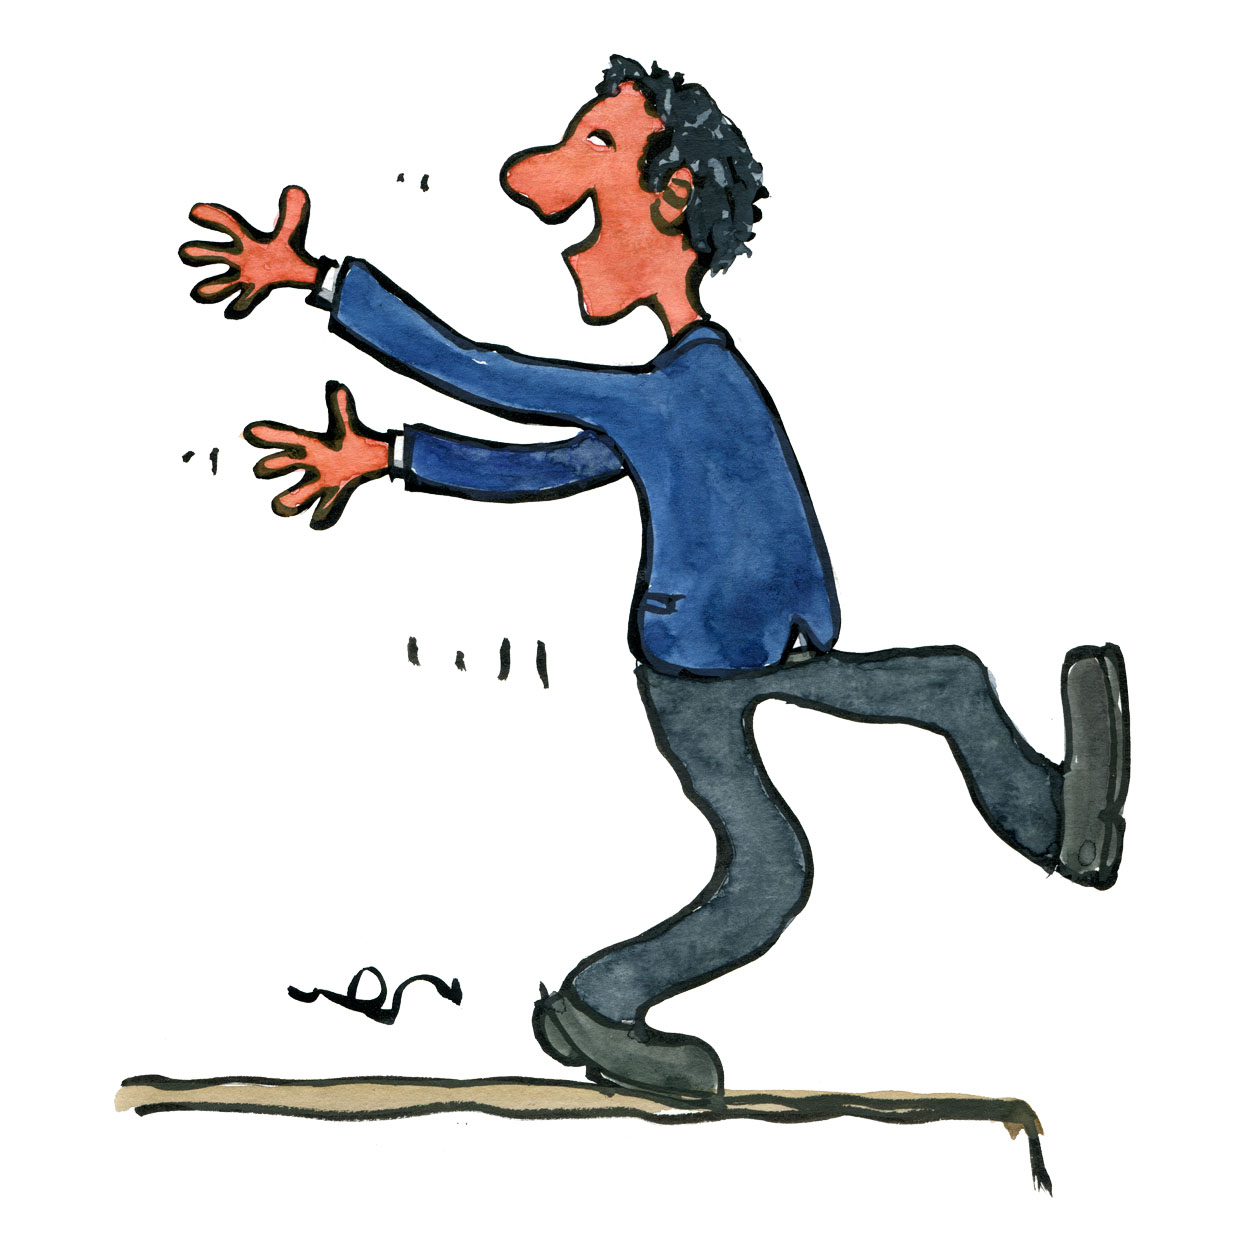 illustration-man-walking-forward-edge-looking-back-drawing-by-frits-ahlefeldt  – Frits Ahlefeldt – FritsAhlefeldt.com